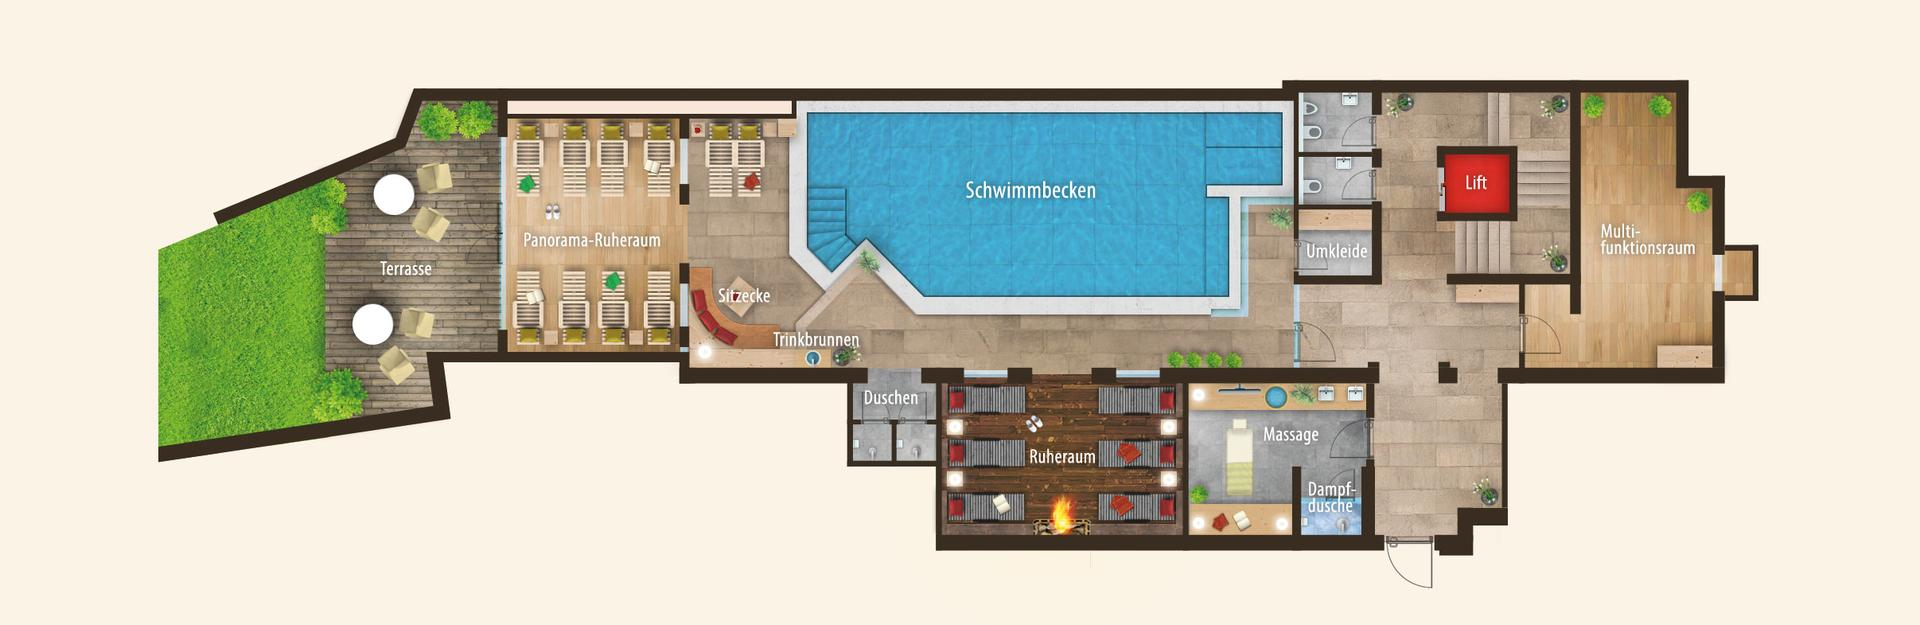 100 The Canyon Bay I Ft32684a 6 Bedroom Modular